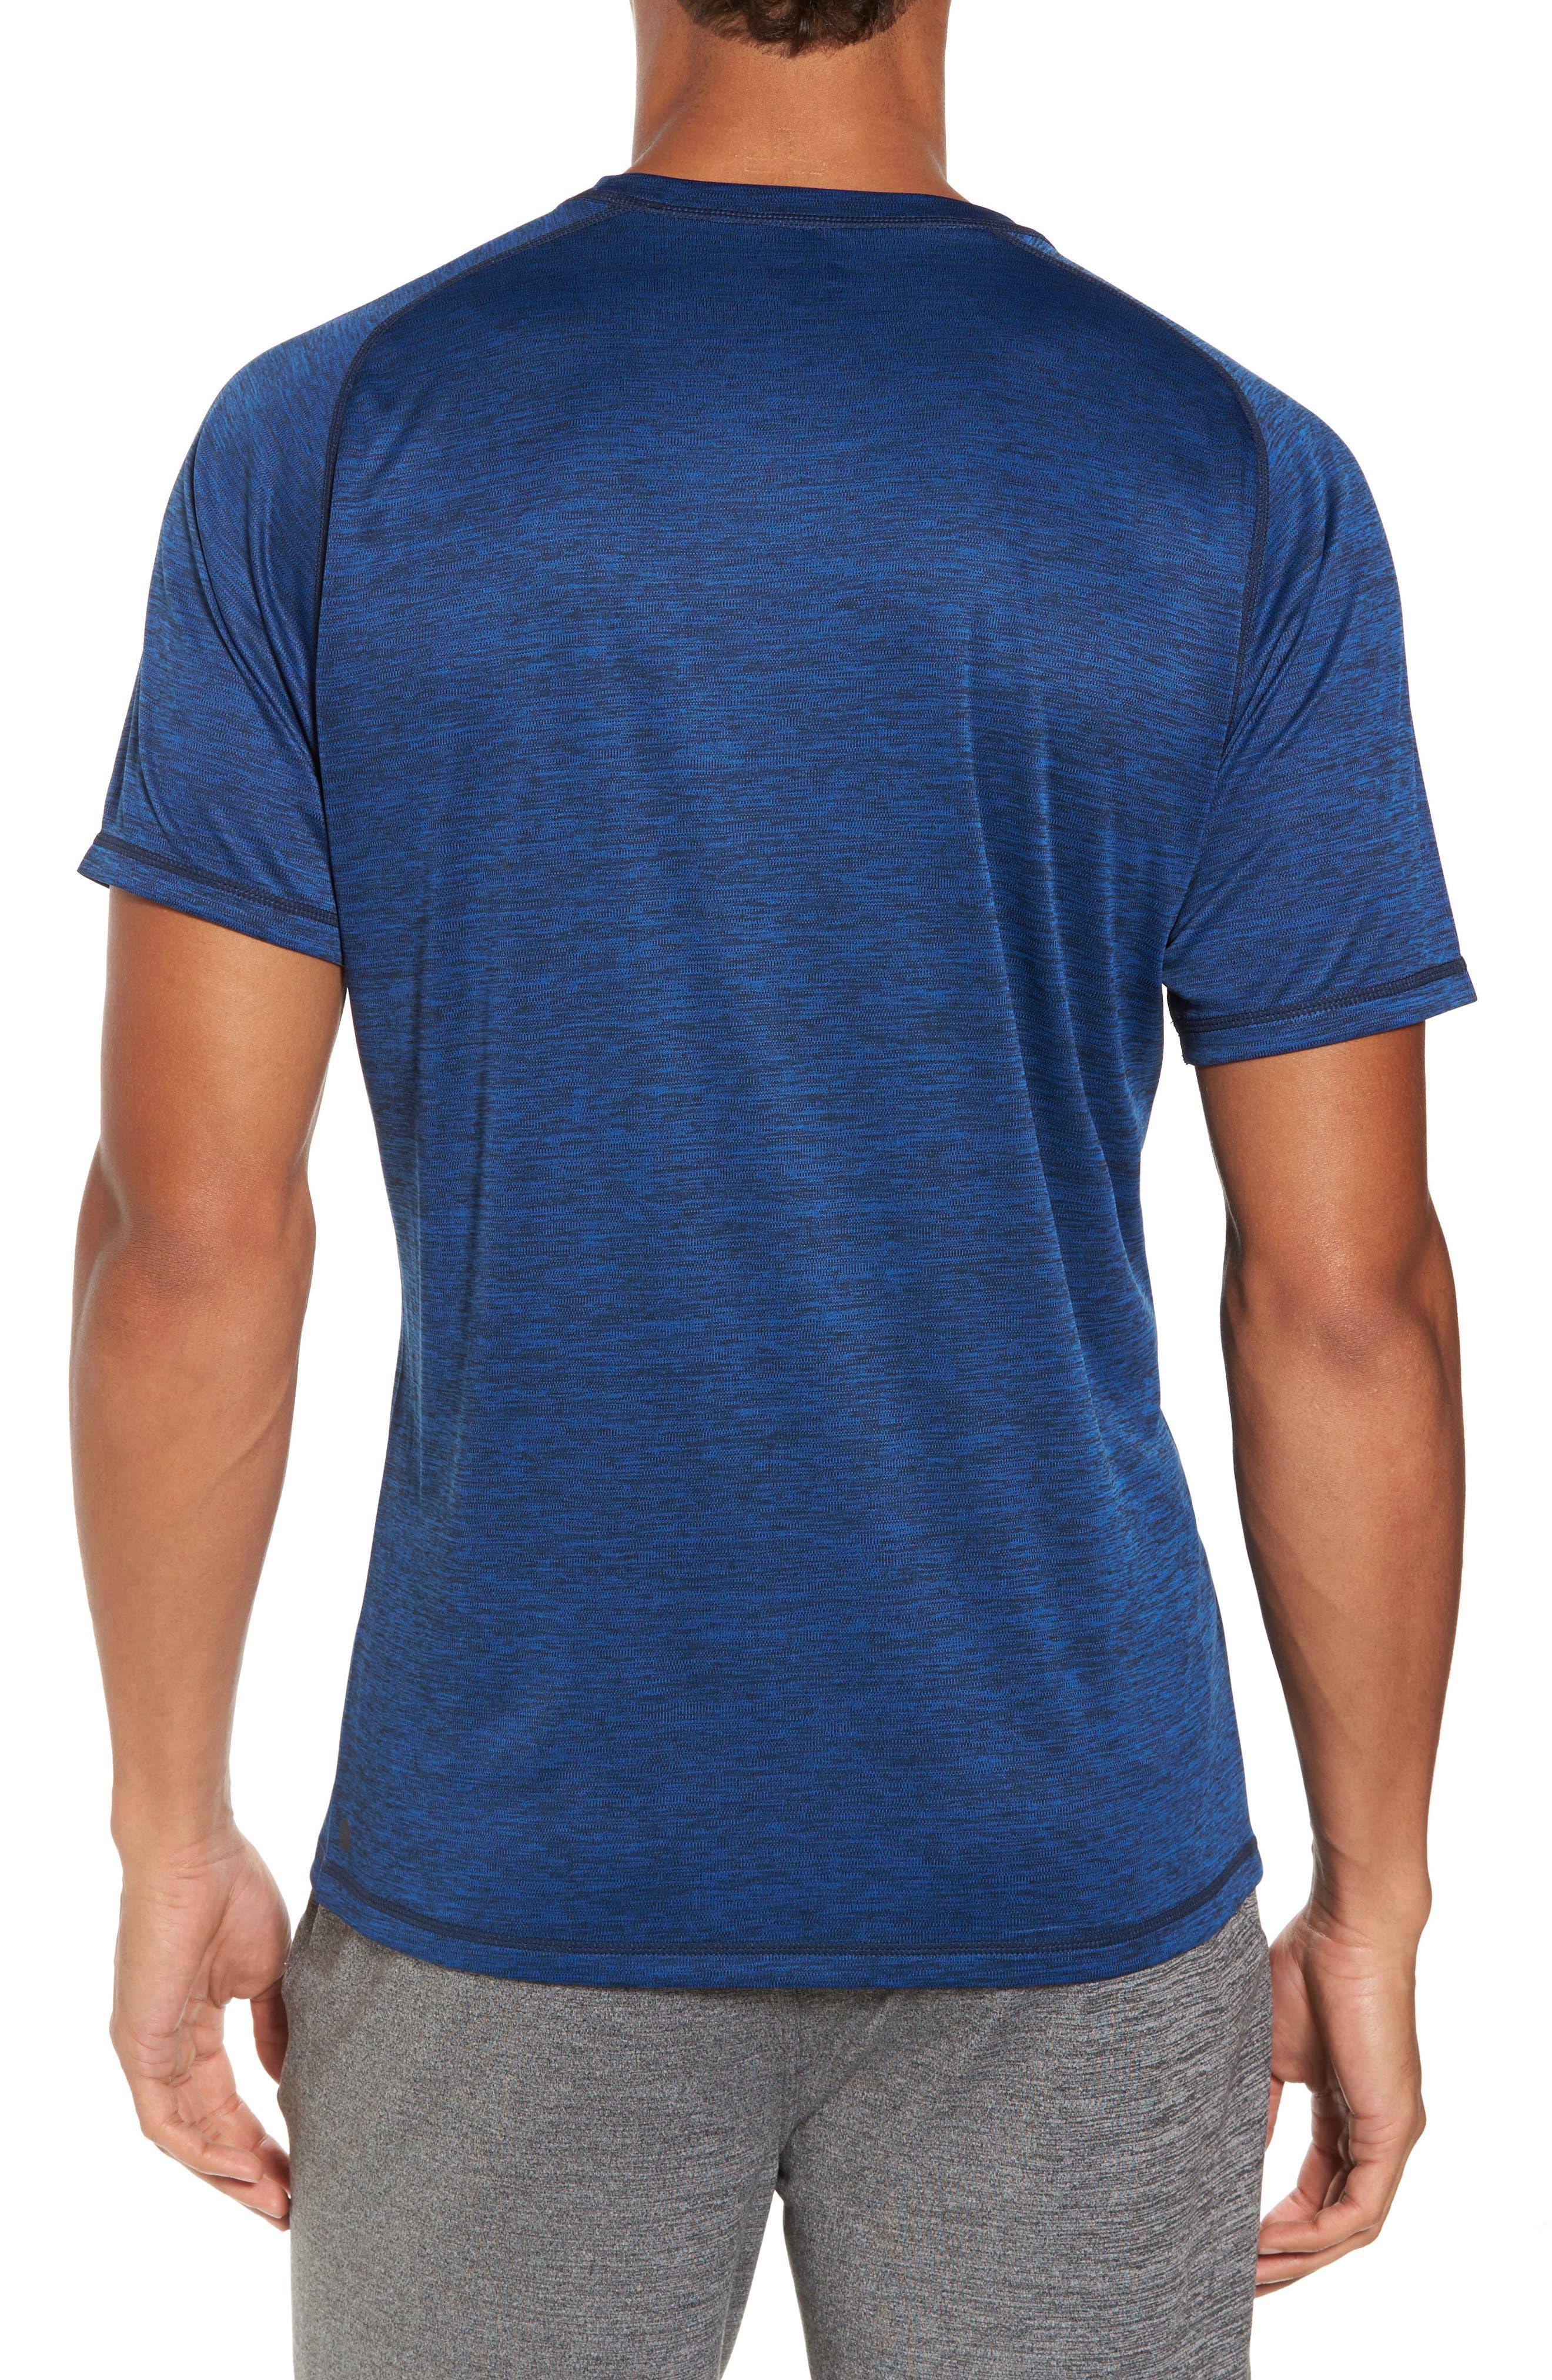 Triplite T-Shirt,                             Alternate thumbnail 2, color,                             Navy Malachite Melange